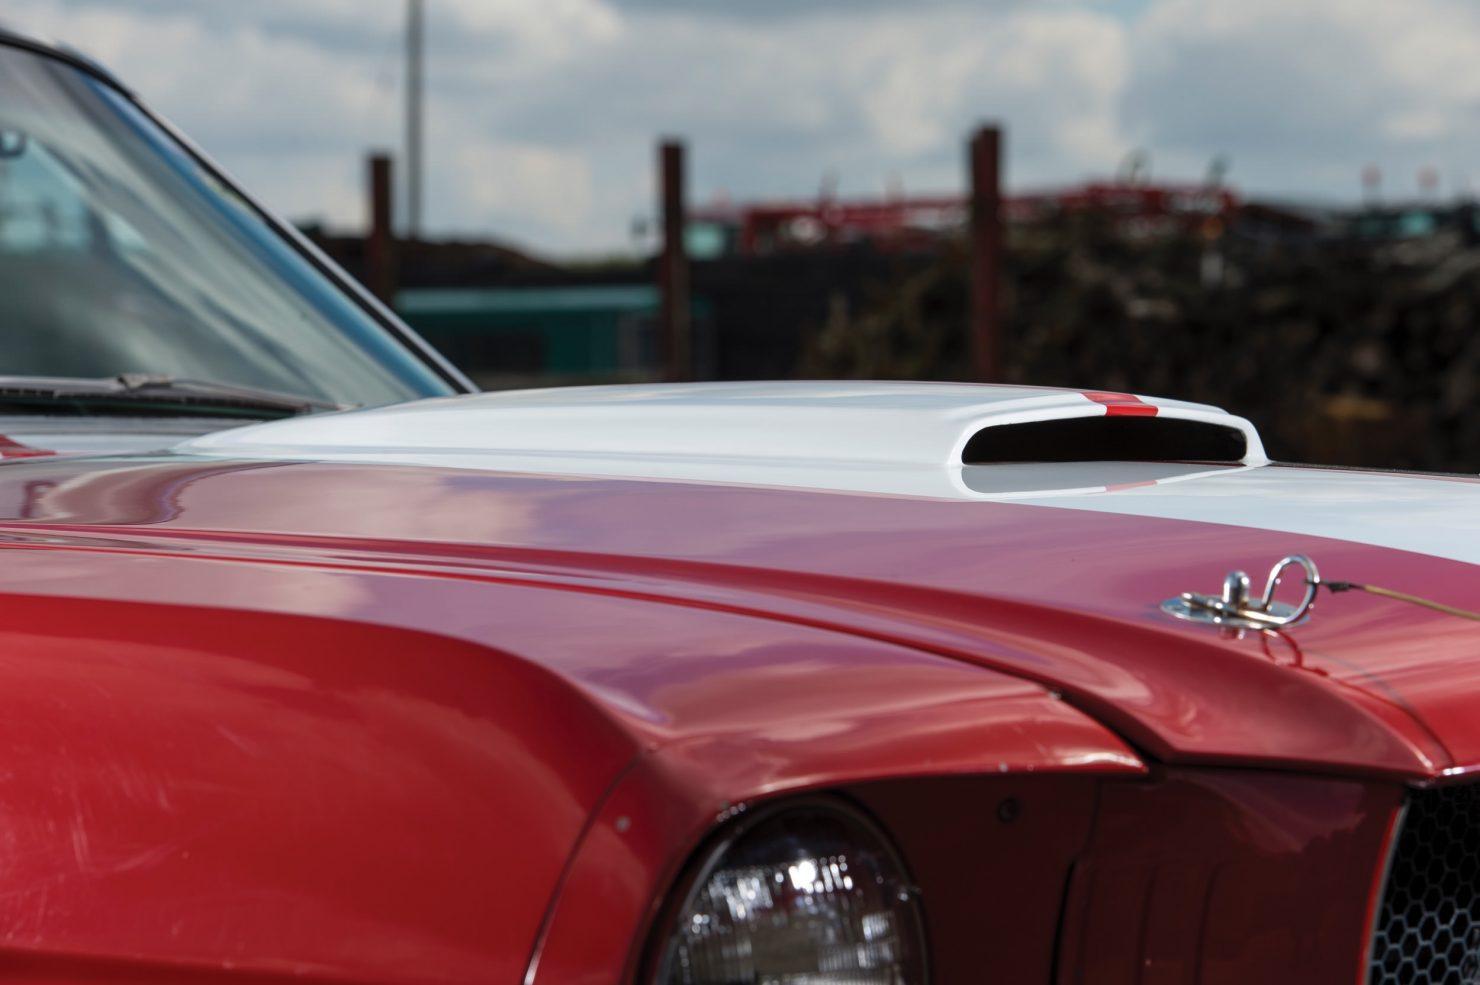 shelby gt350 race car 16 1480x985 - 1966 Shelby GT350 - Period SCCA Race Car